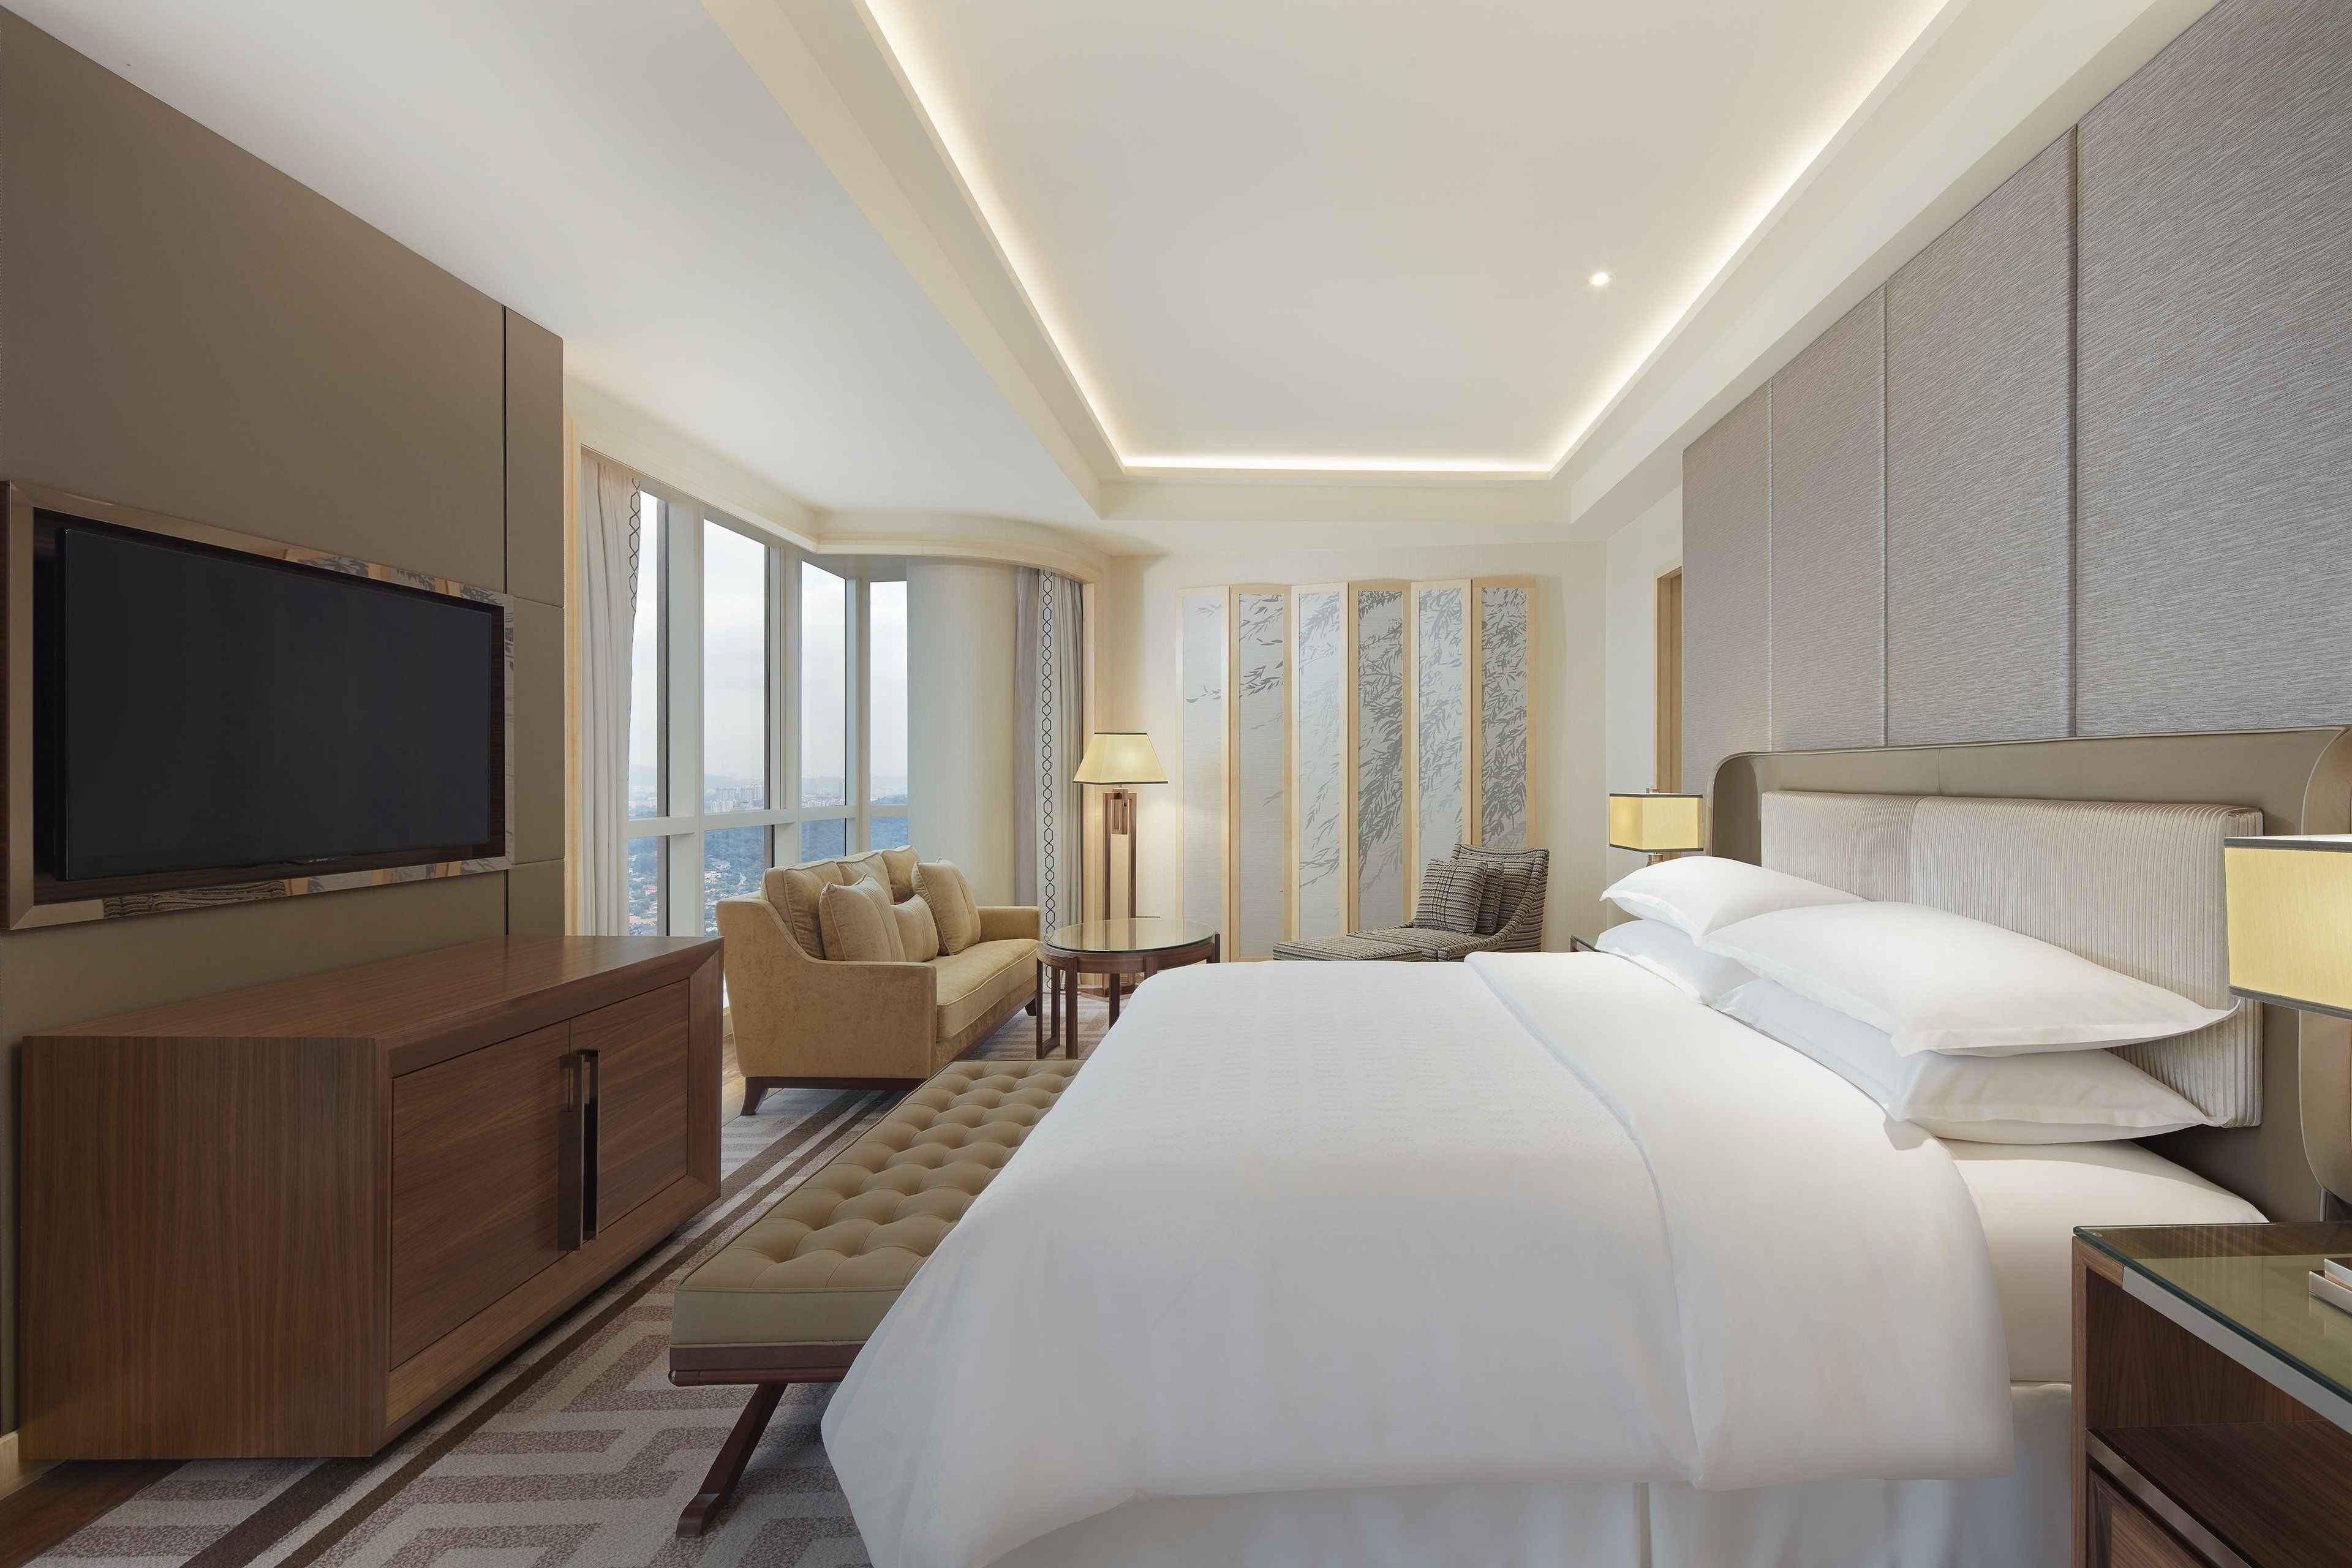 Courtesy of Sheraton Petaling Jaya Hotel / Expedia